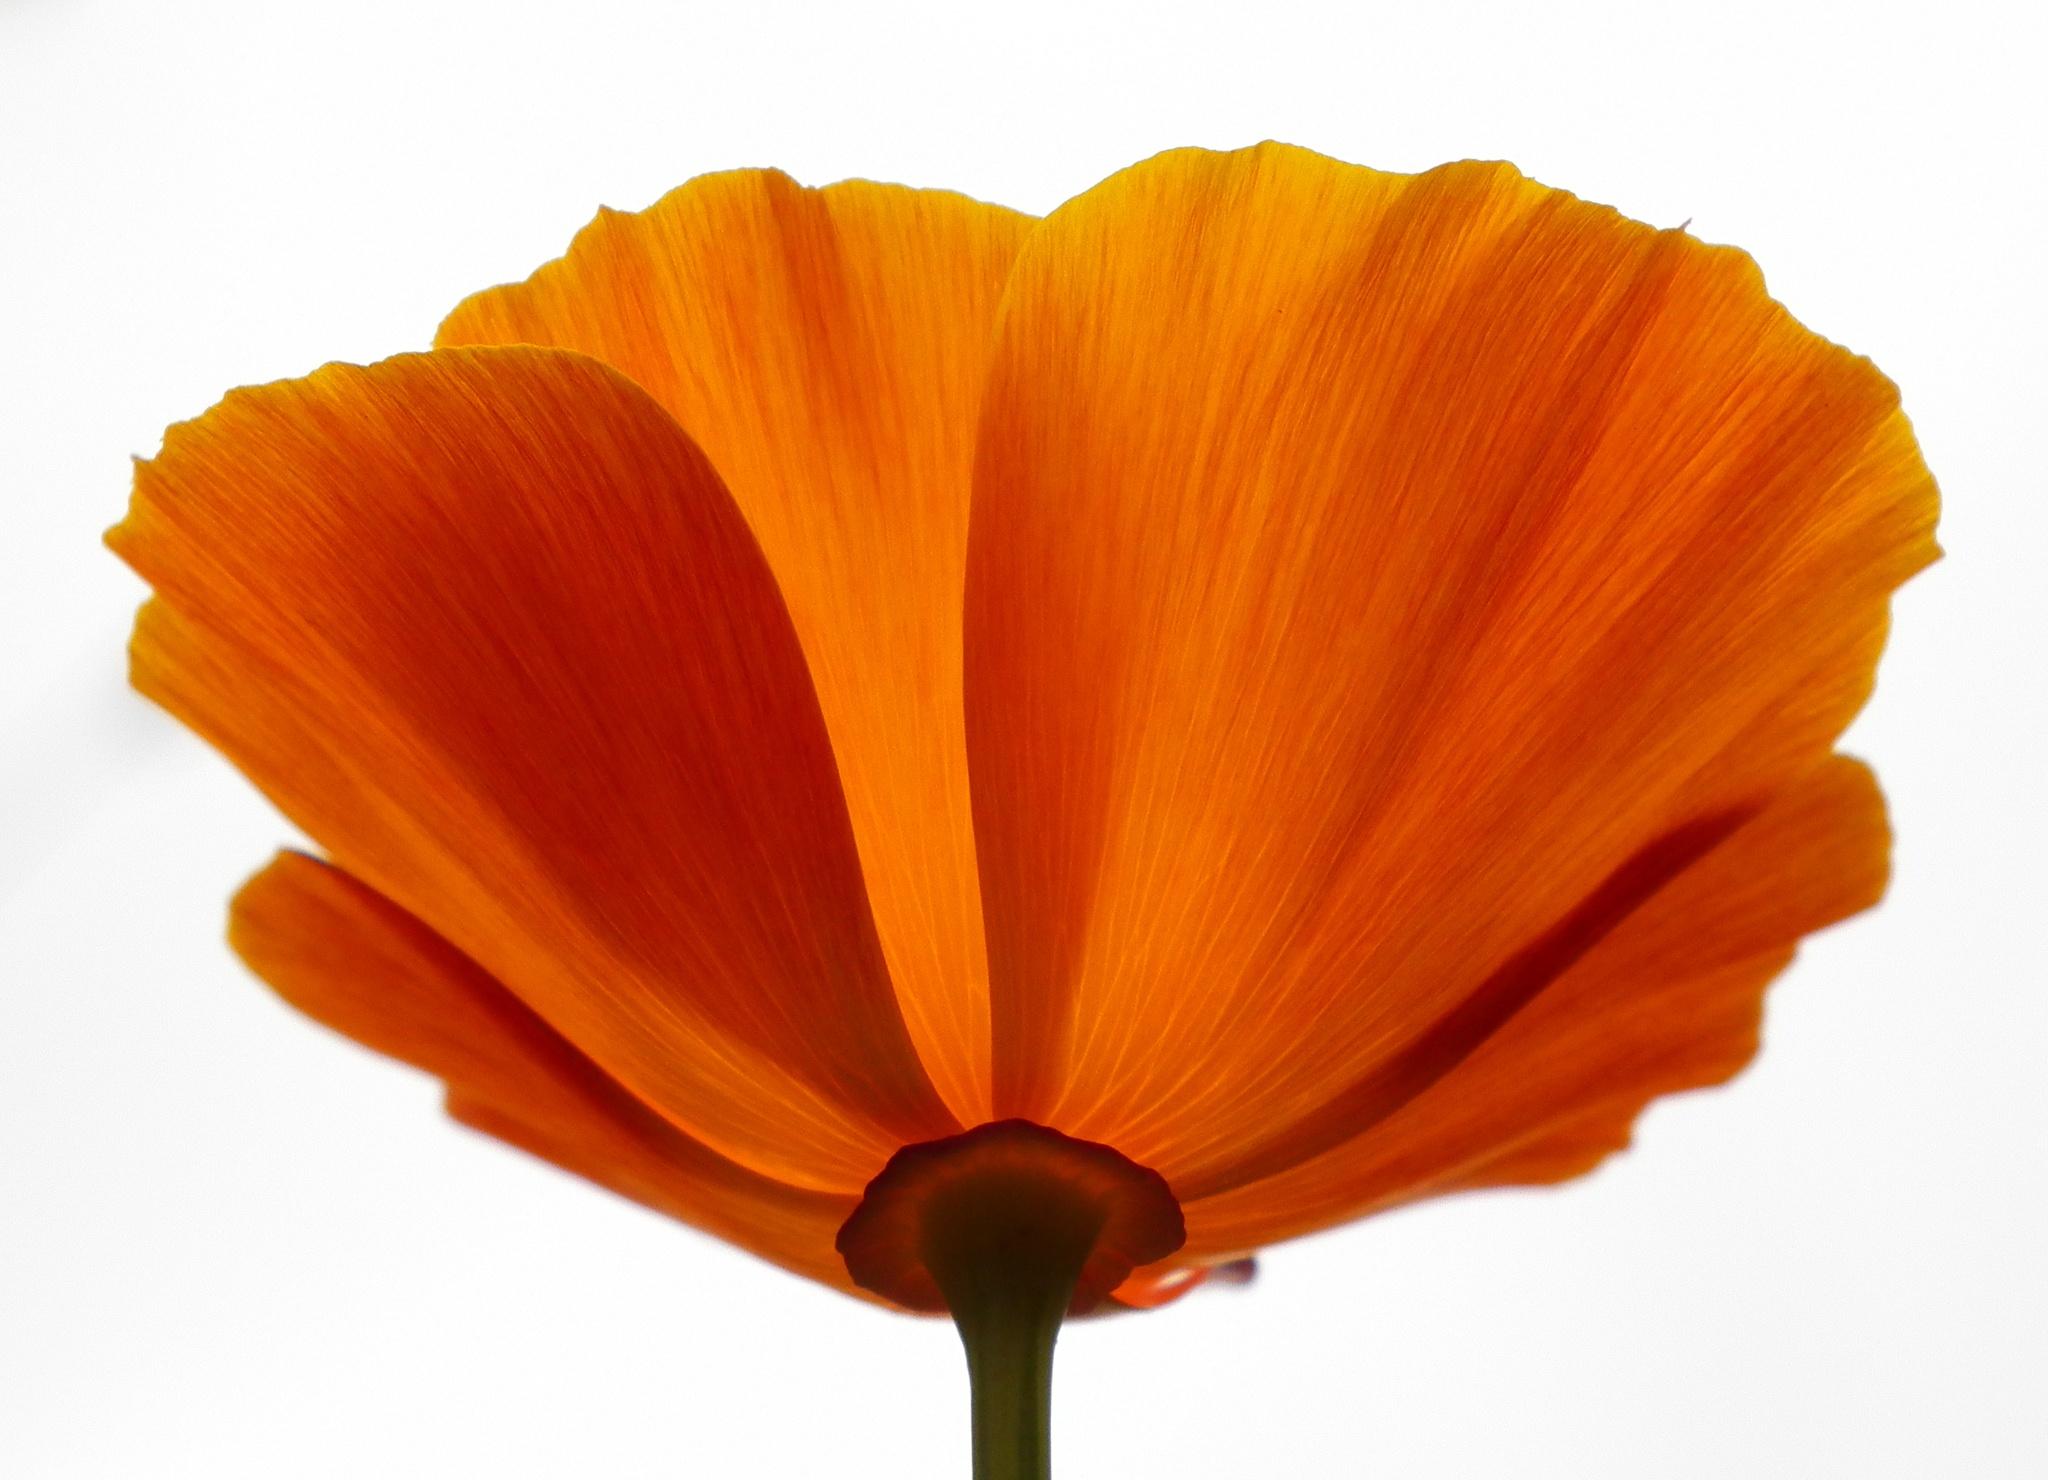 Orange poppy by Dave Bloor Snr